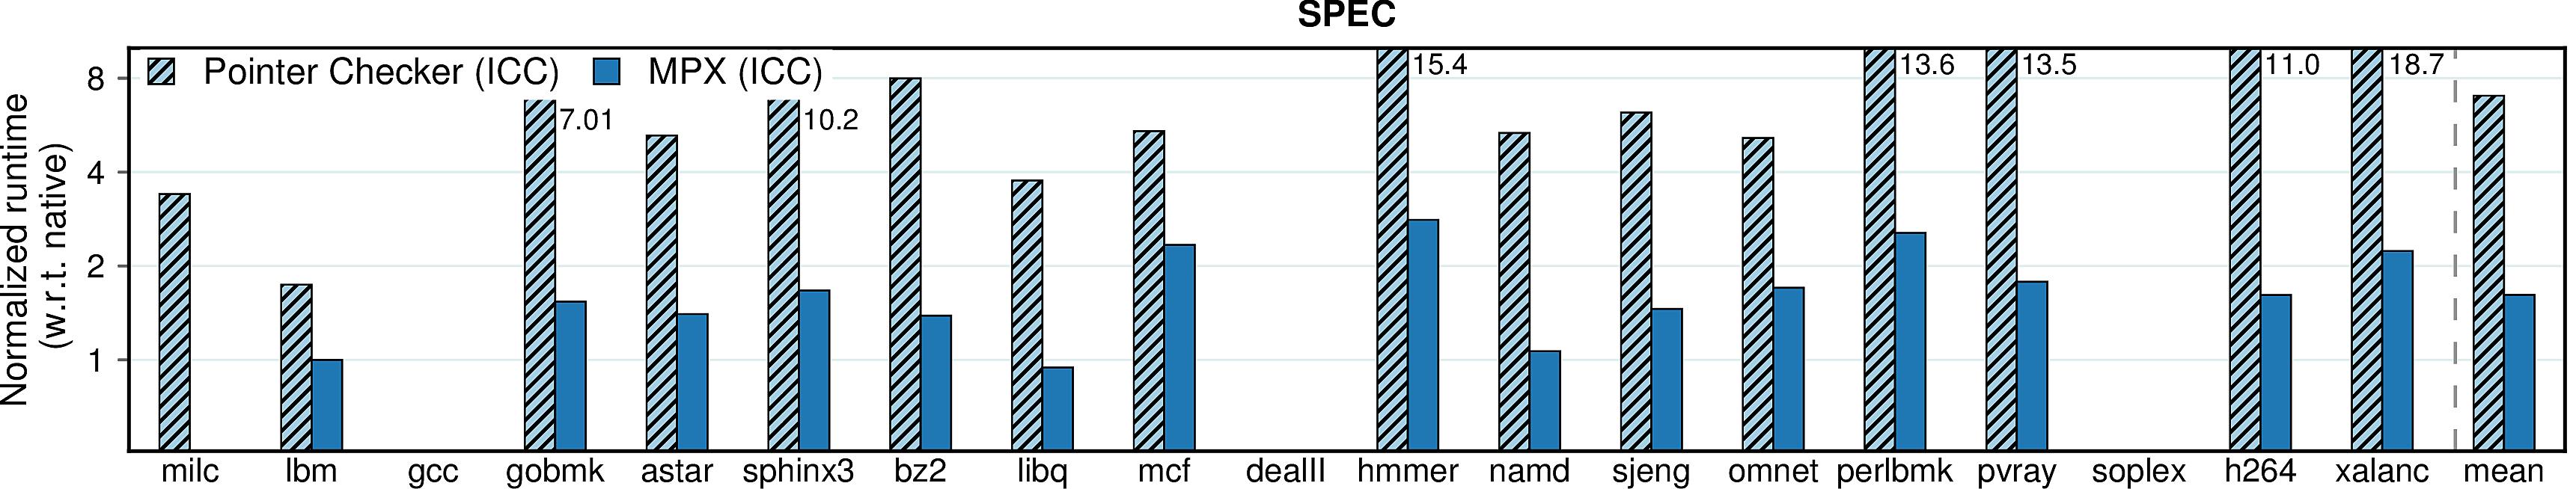 Runtime overhead of Pointer Checker (SPEC)